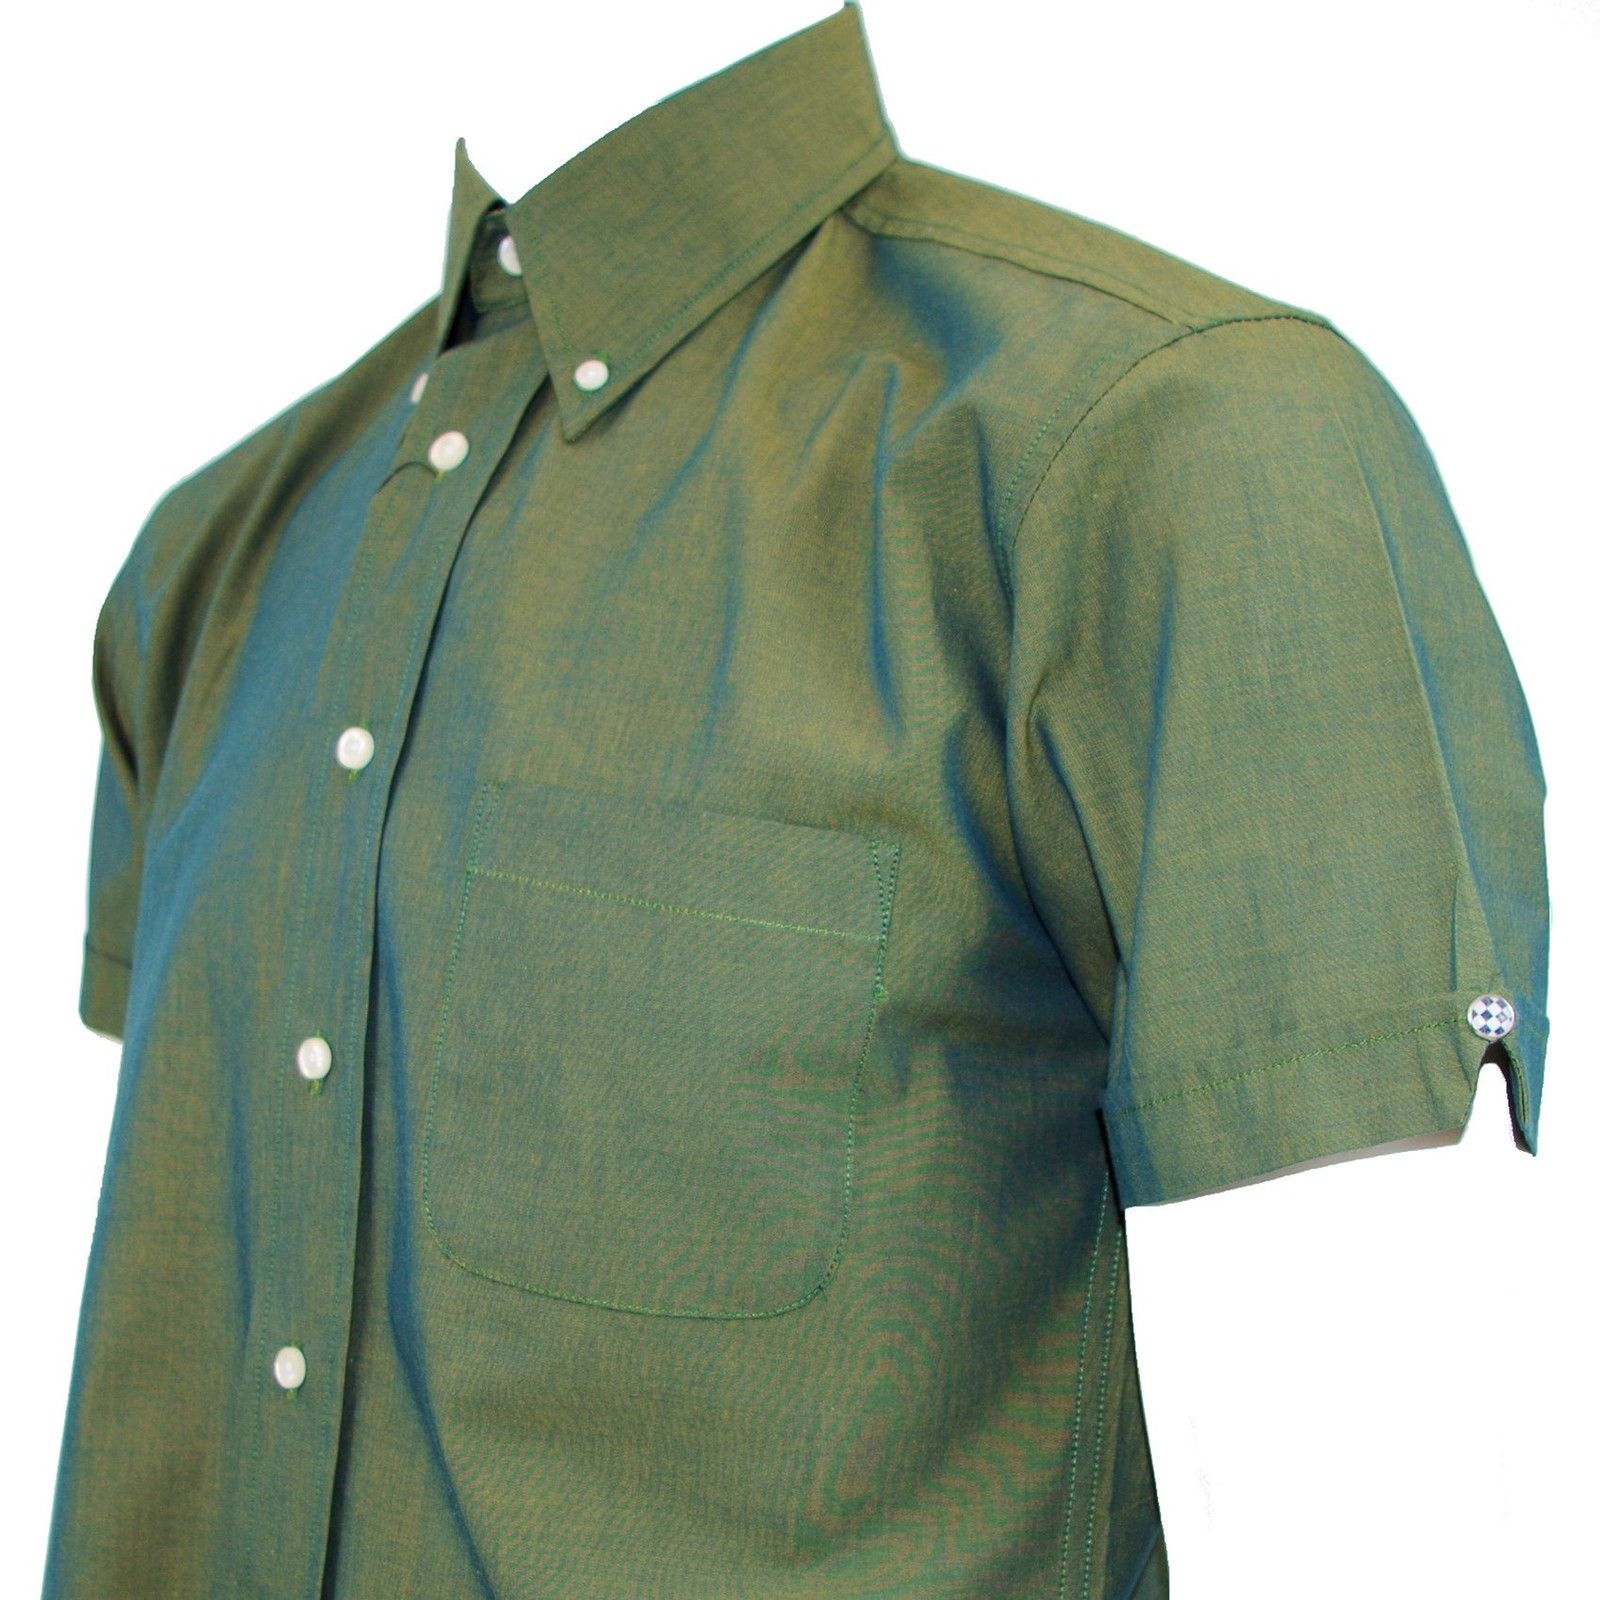 WARRIOR Rico green 2Tone Tonic classic button-down shirt size small-4XL